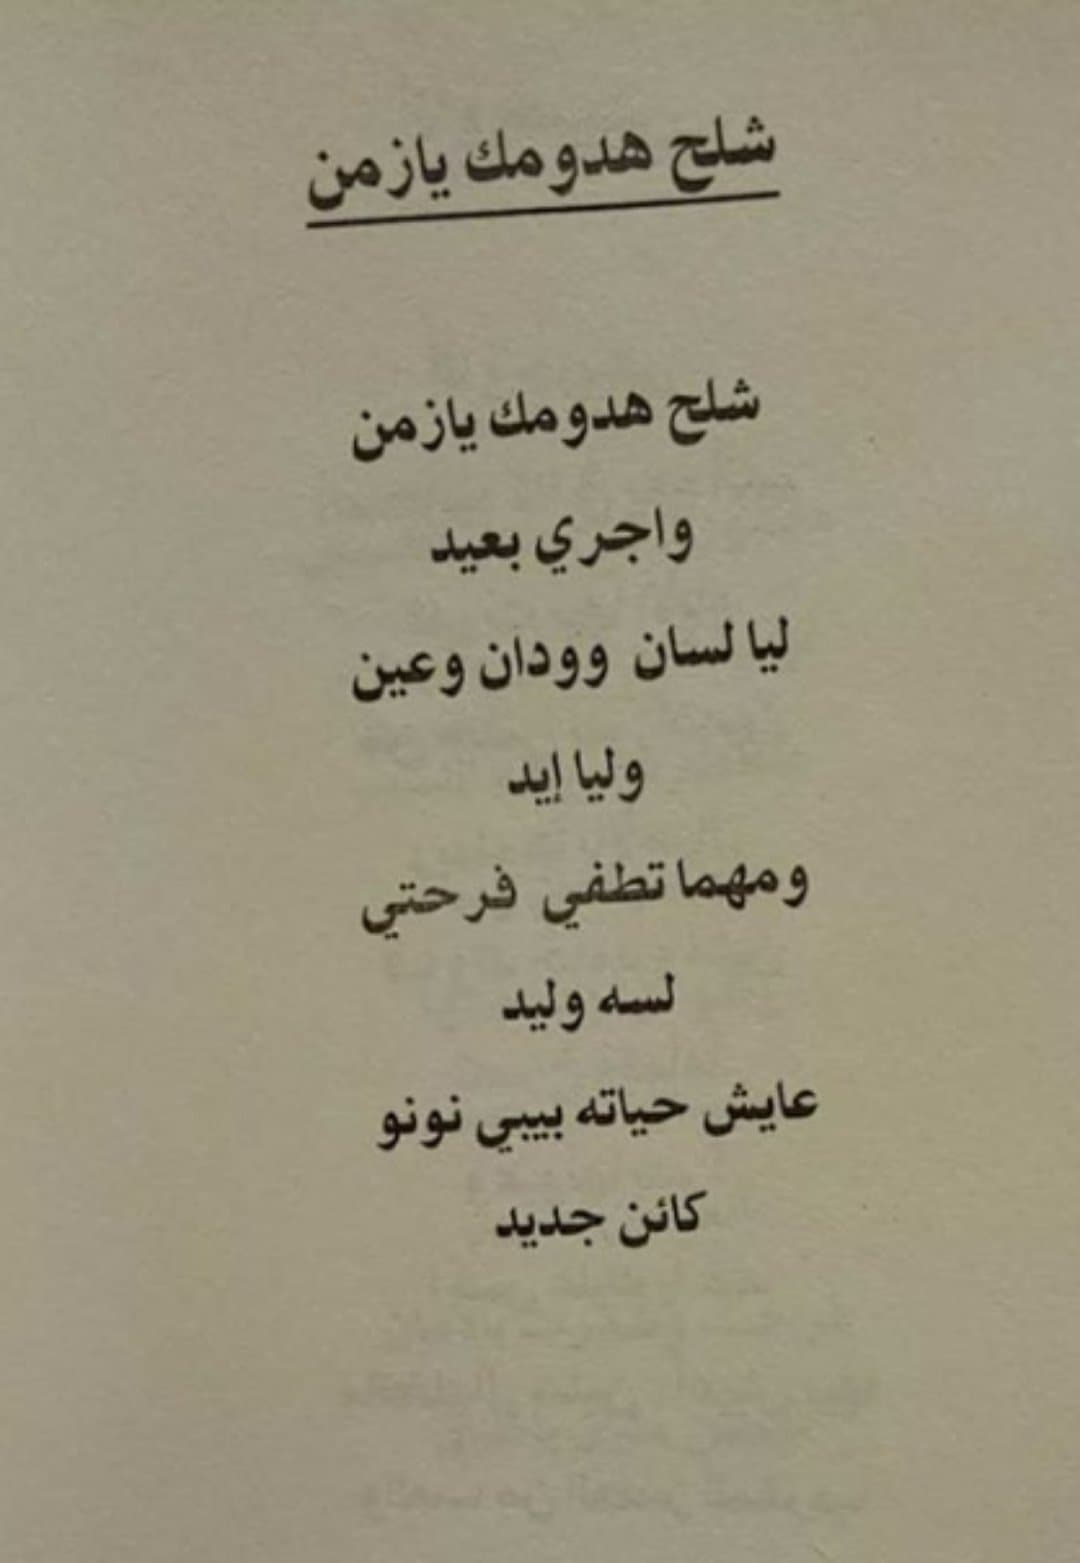 "Photo of قصيدة "" شلح هدومك يا زمن "" في معرض القاهرة الدولي للكتاب"